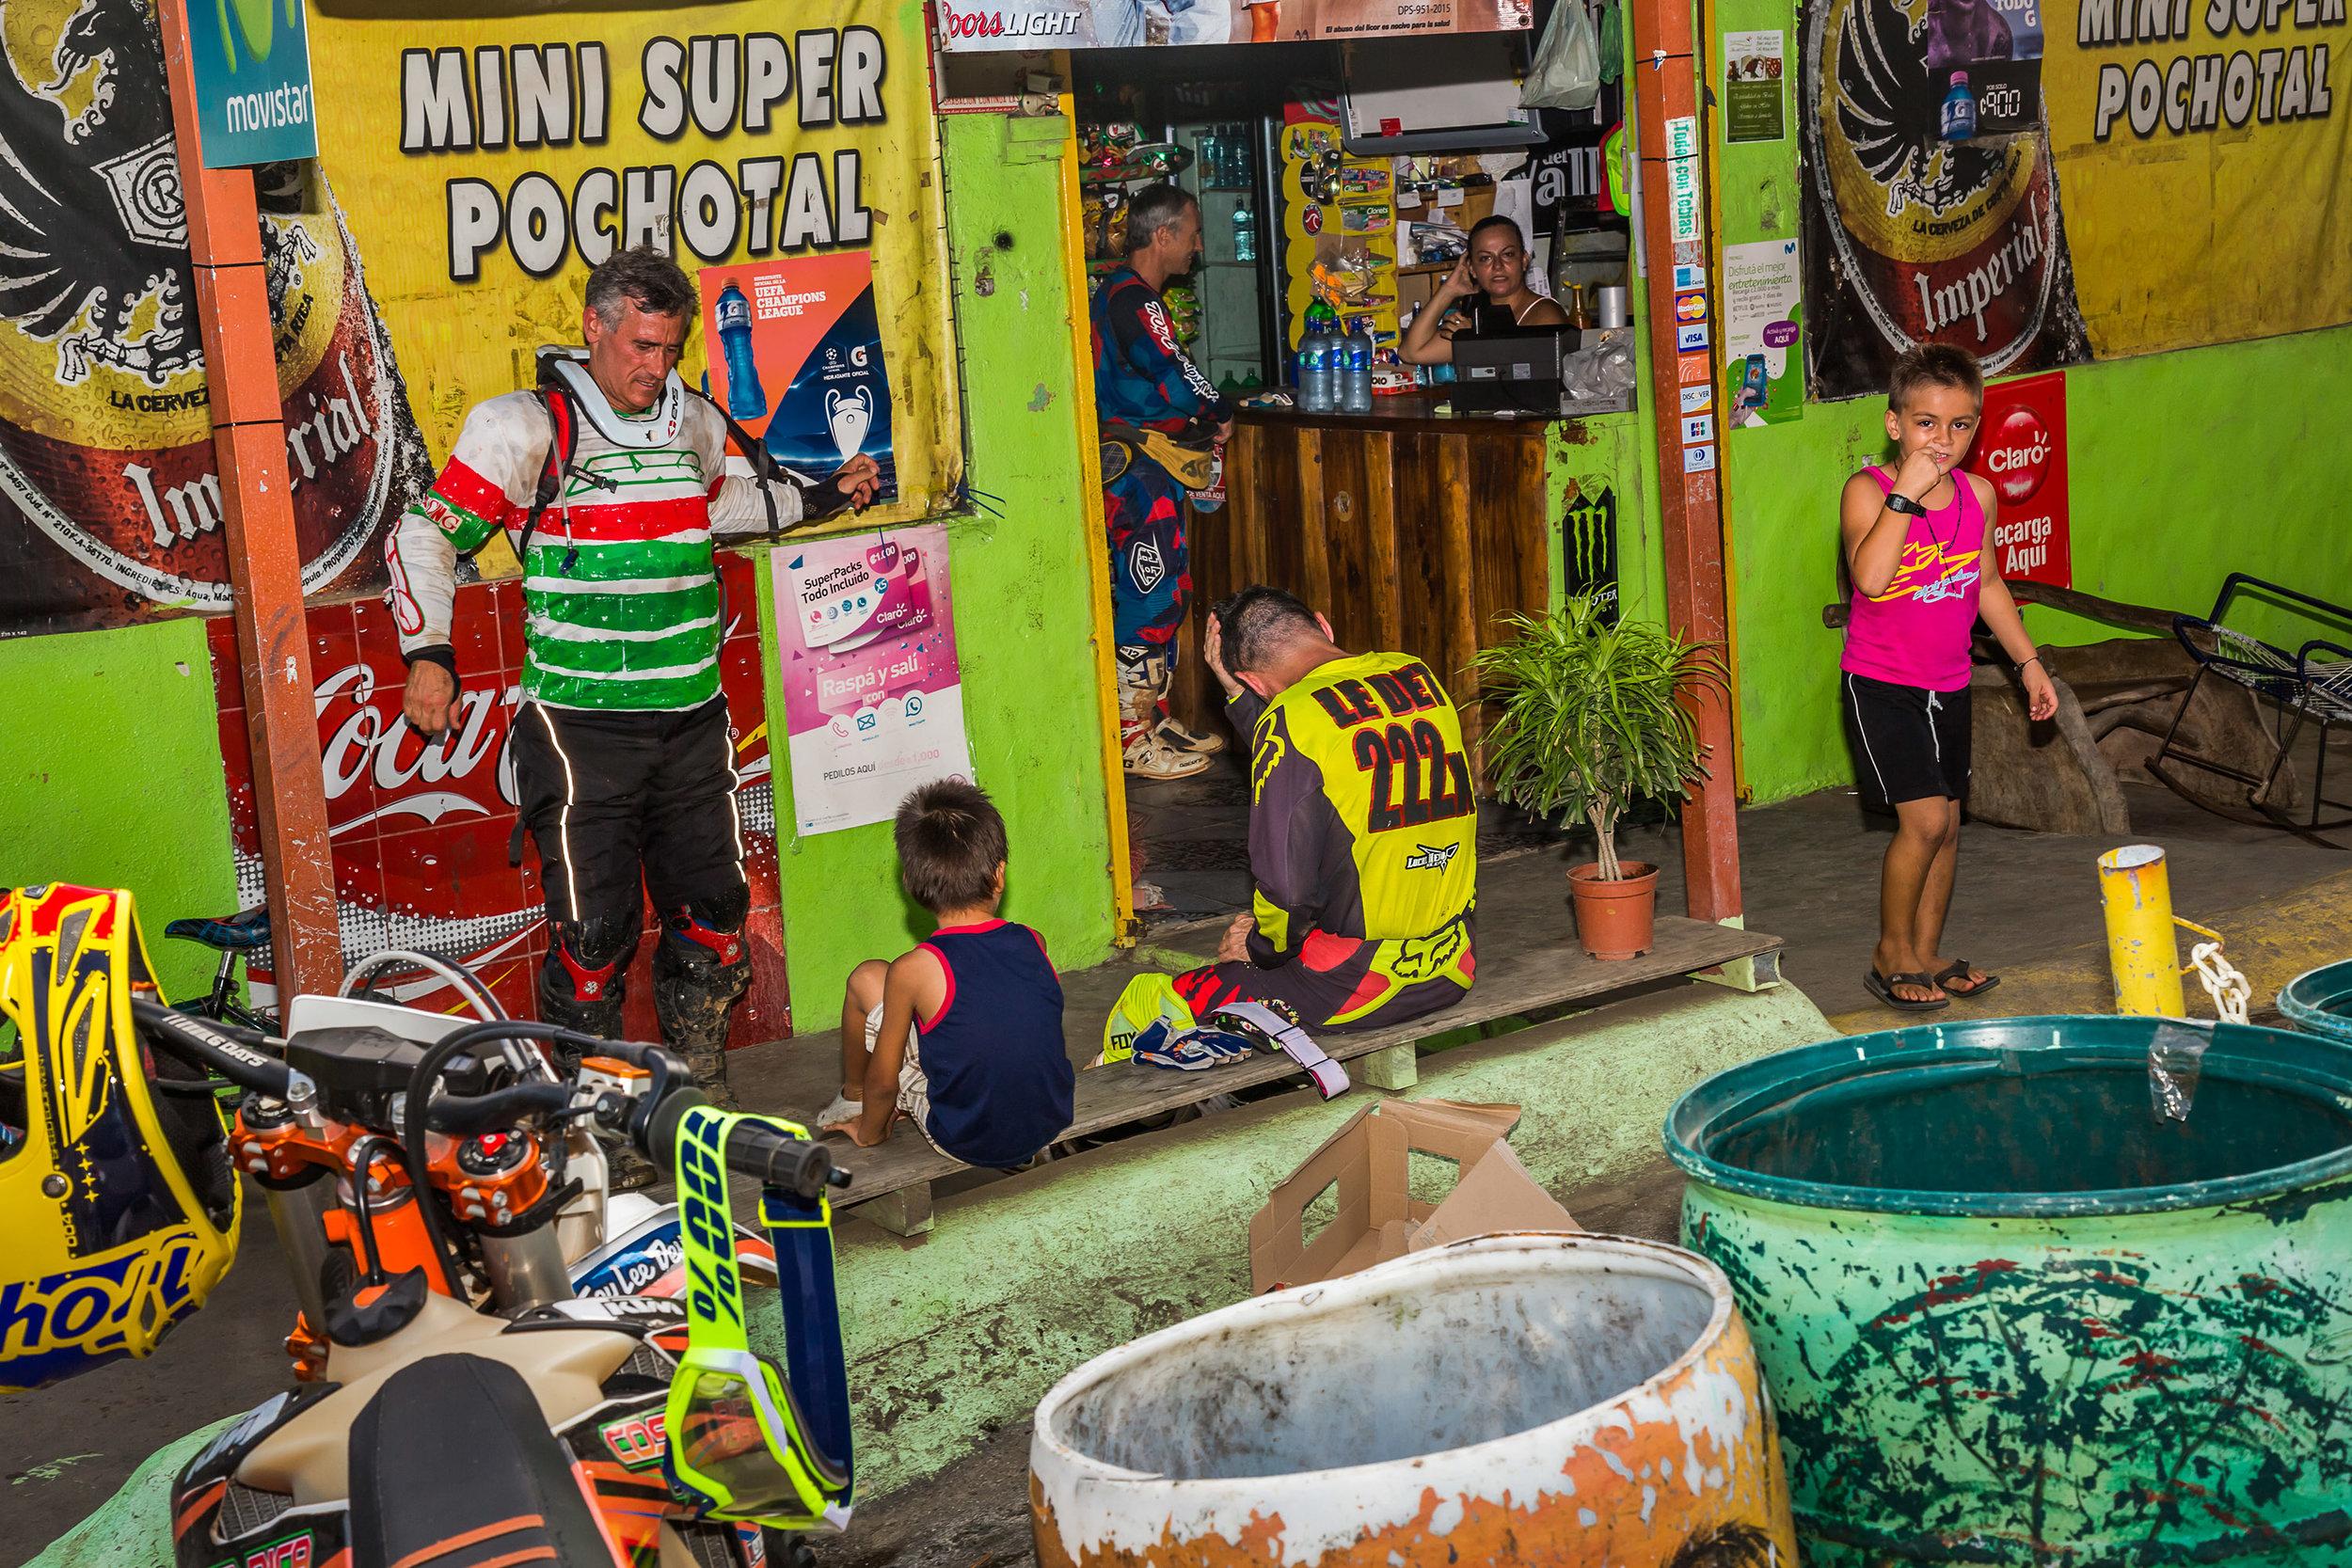 Costa_Rica-ODV_5451.jpg